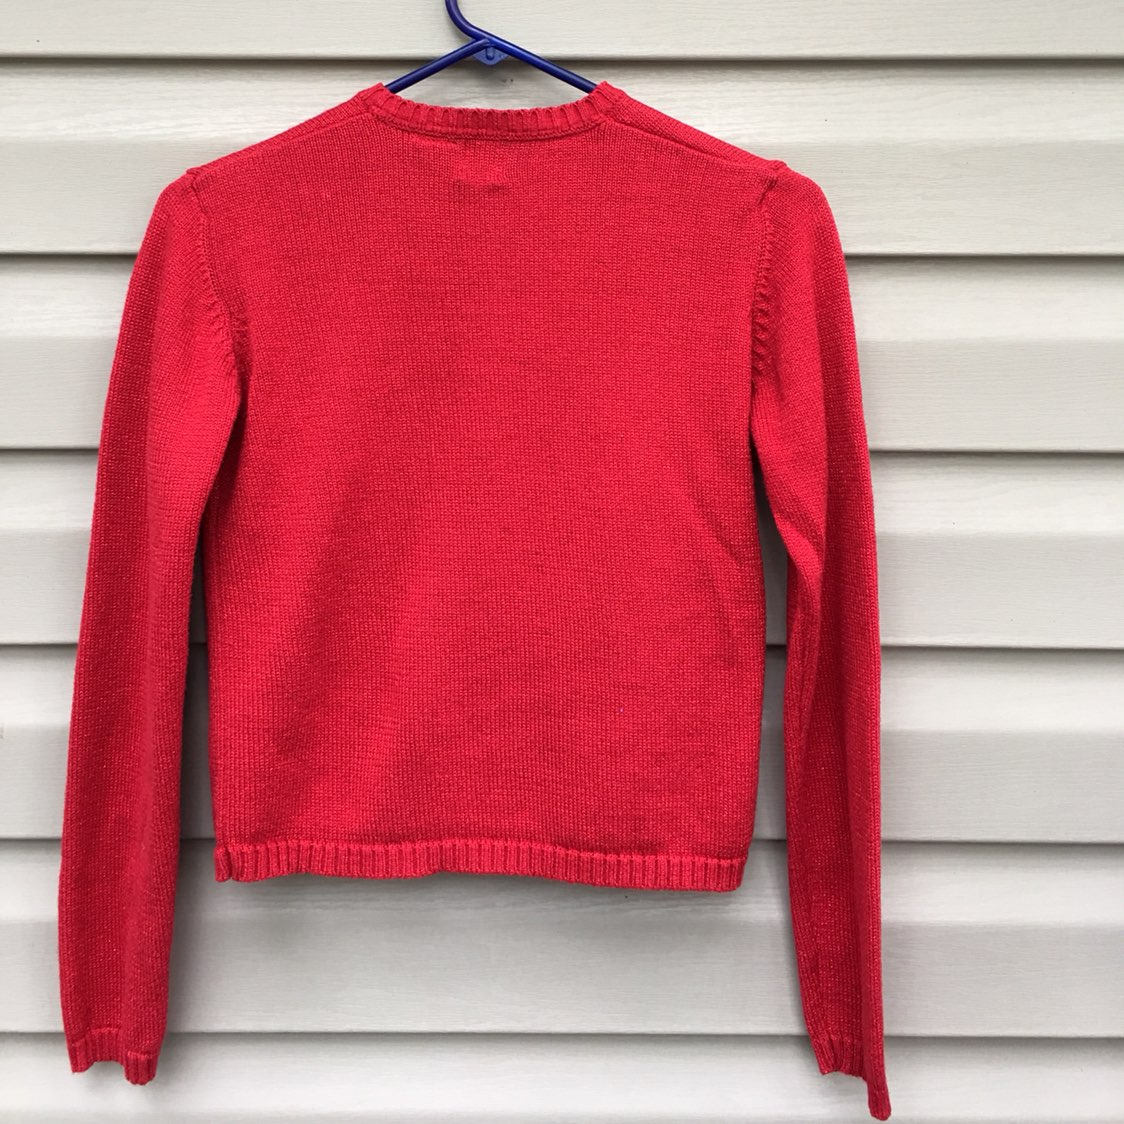 Gap Girls Red Sparkly Cardigan Sweater - Mercari: BUY & SELL ...